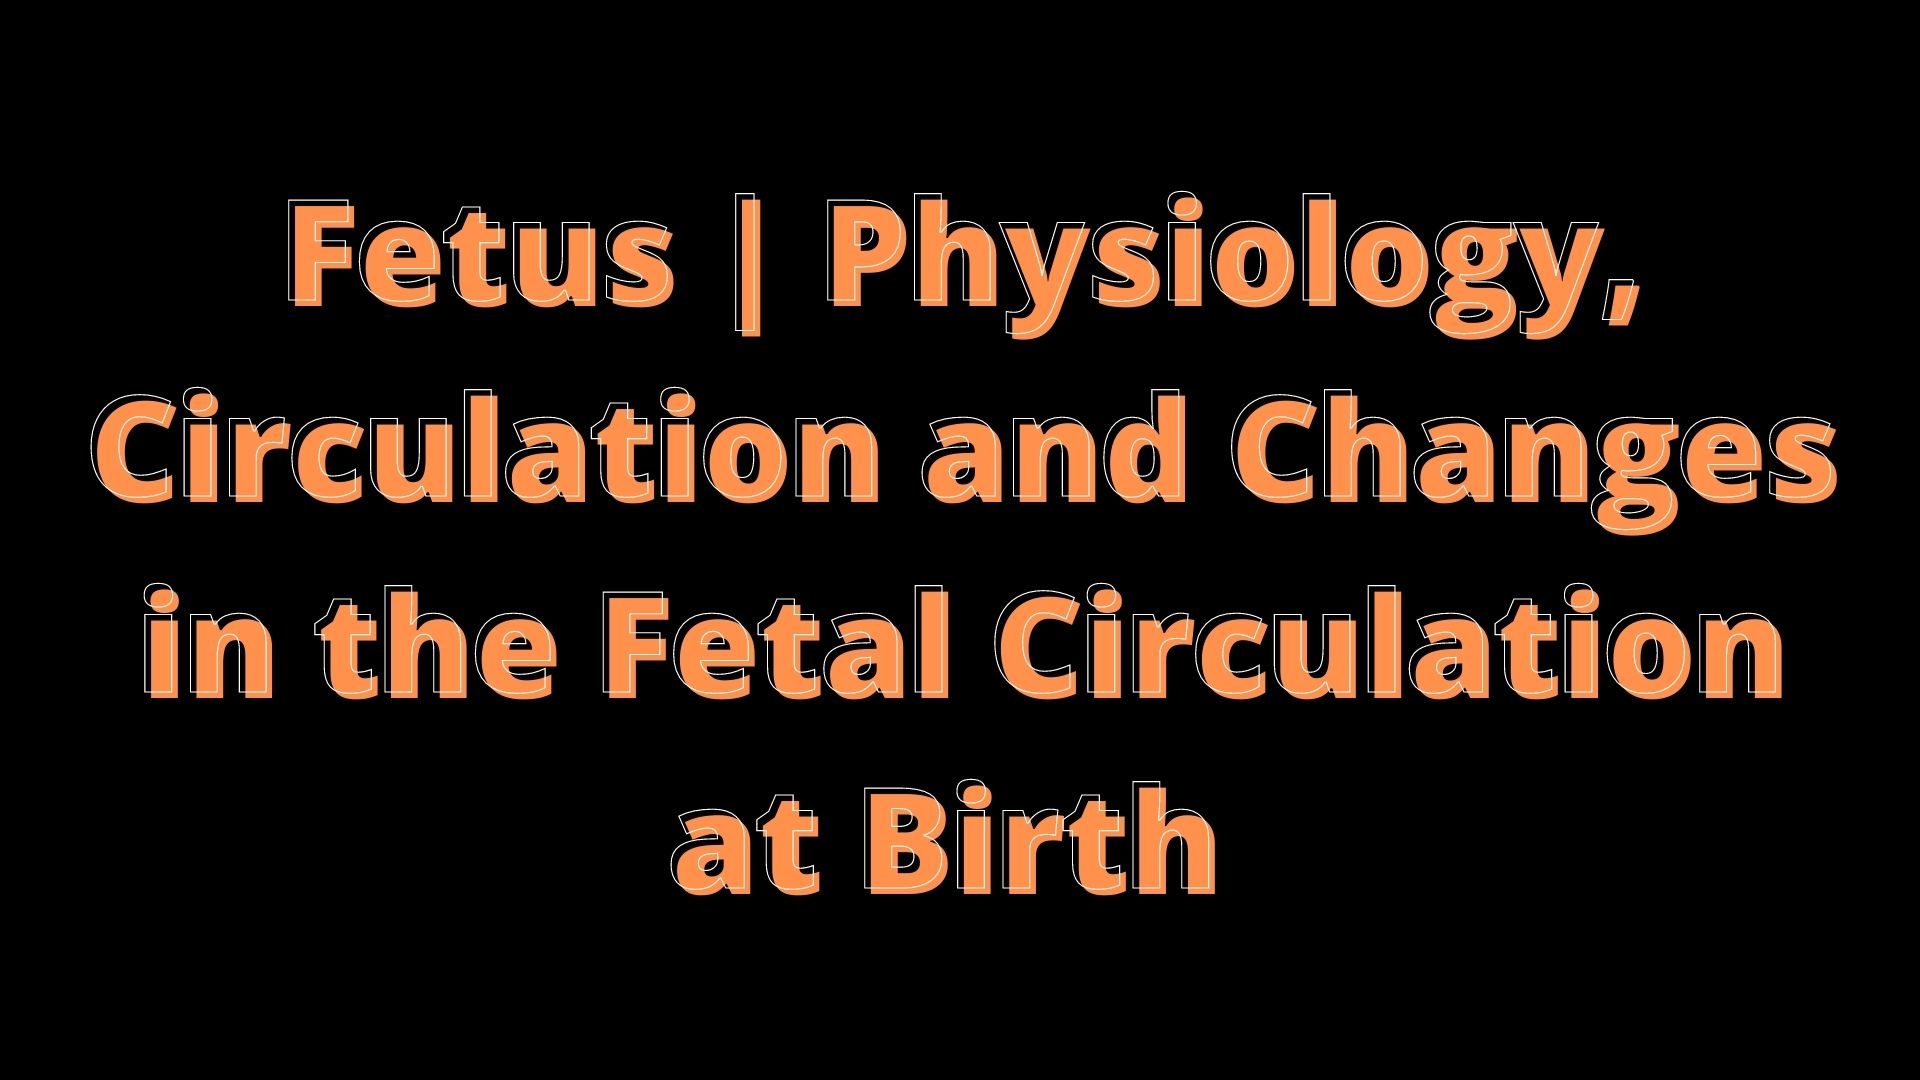 Fetus | Physiology - Circulation